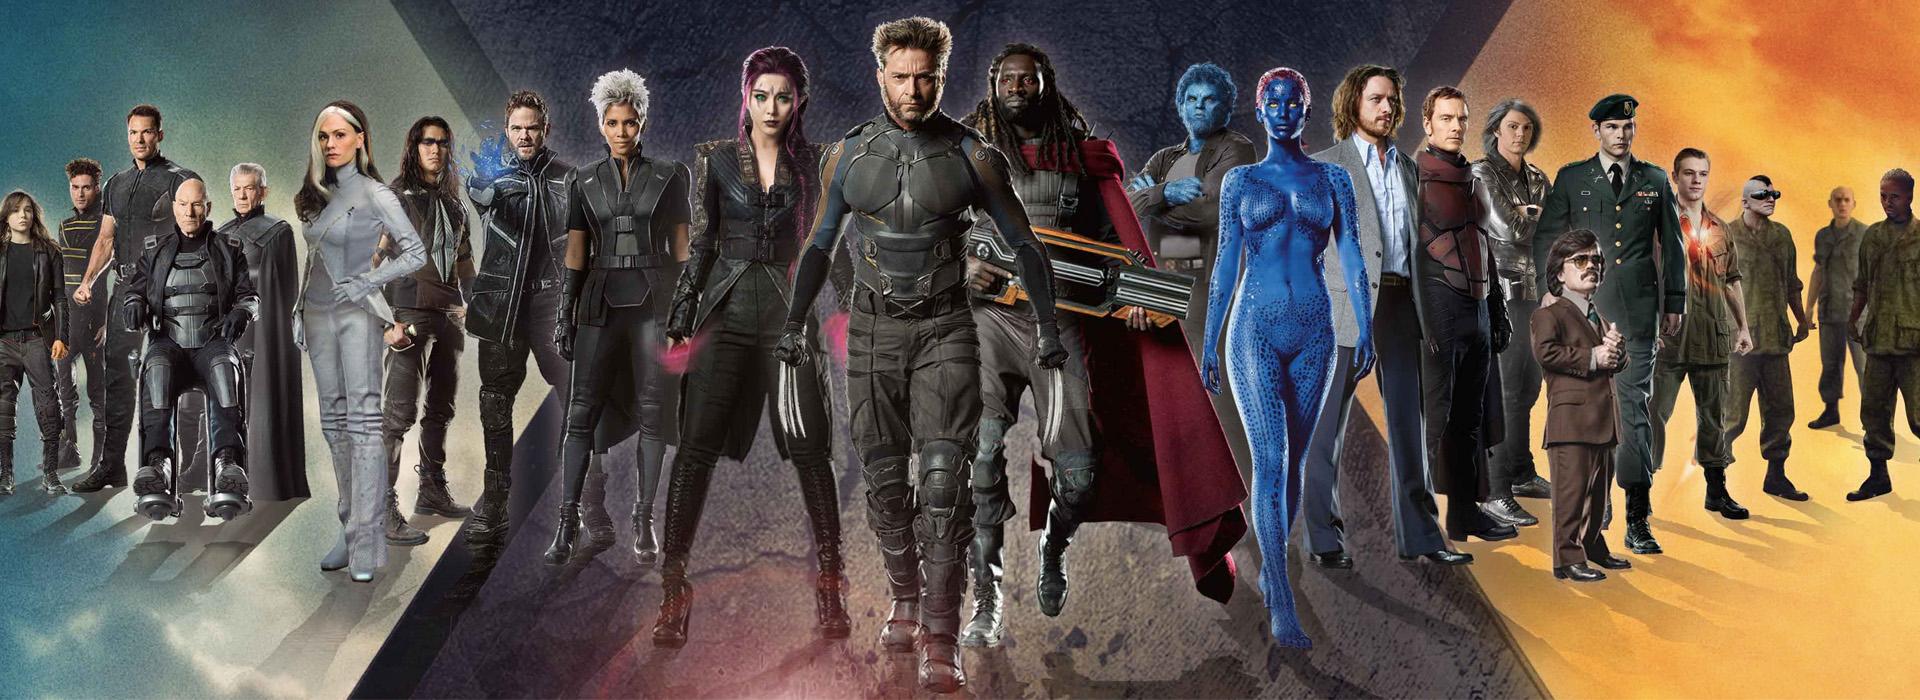 X-Men-Apocalypse-slide